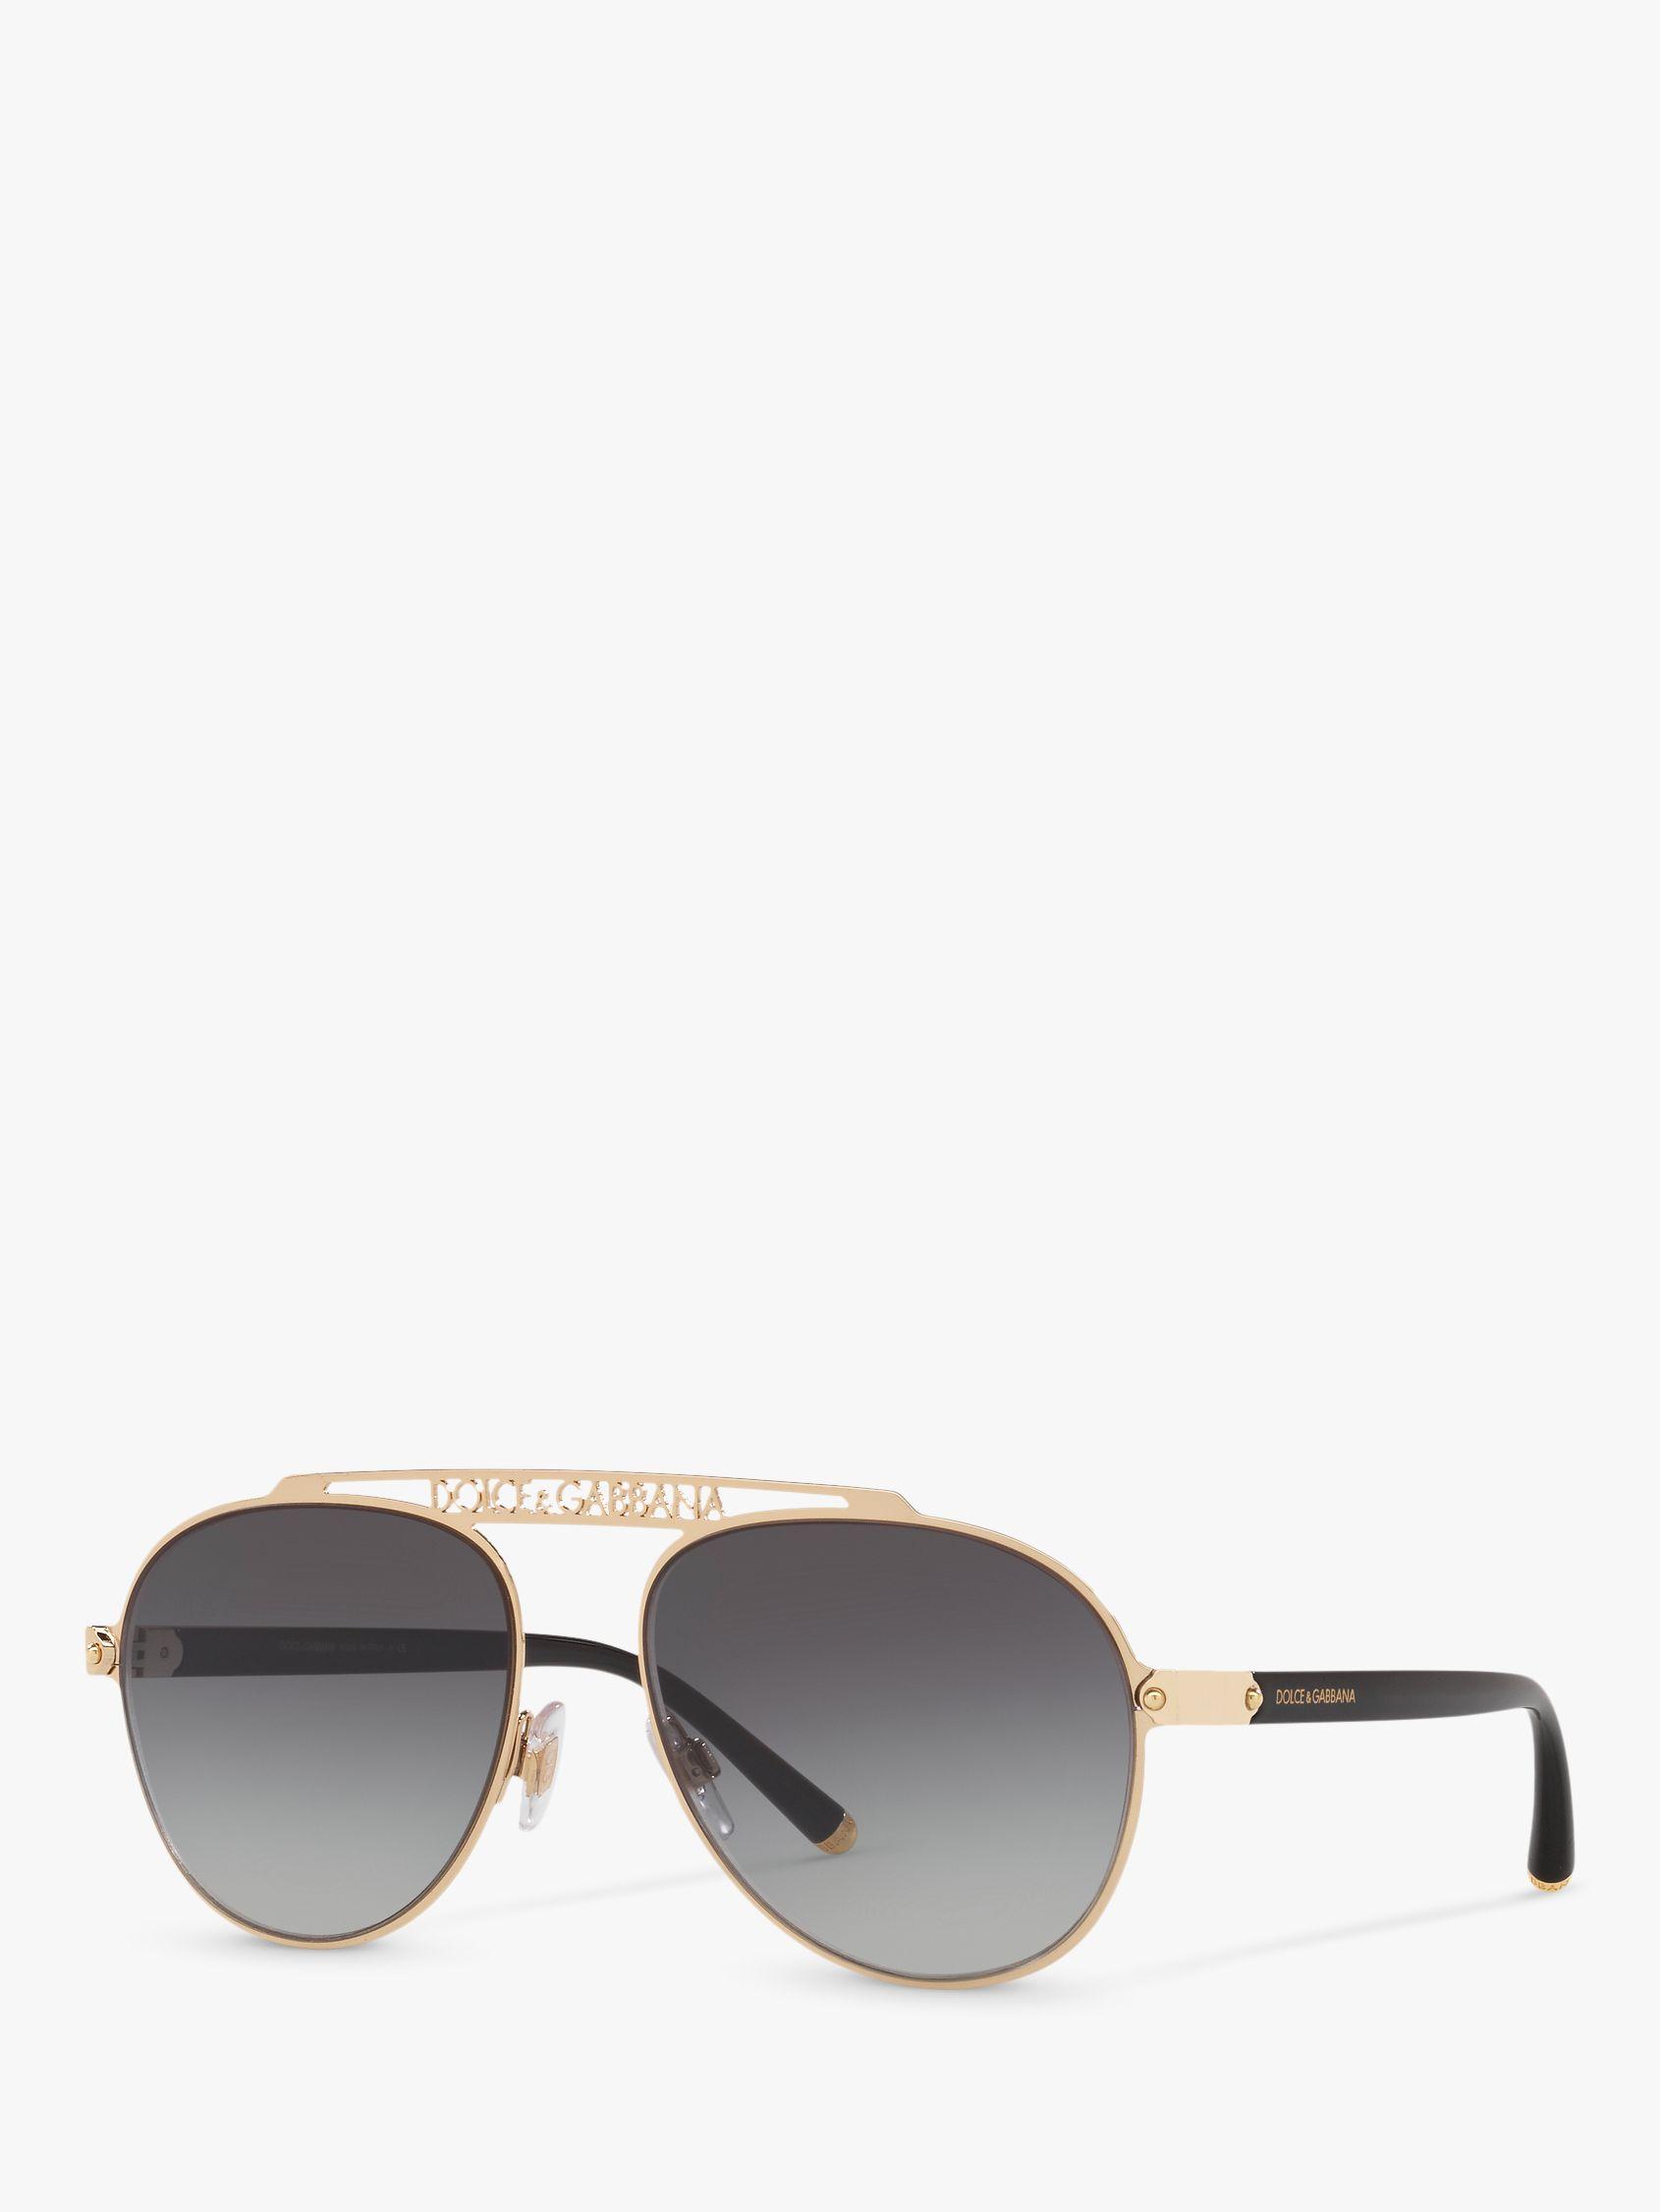 Dolce & Gabbana Dolce & Gabbana DG2235 Women's Aviator Sunglasses, Gold/Grey Gradient